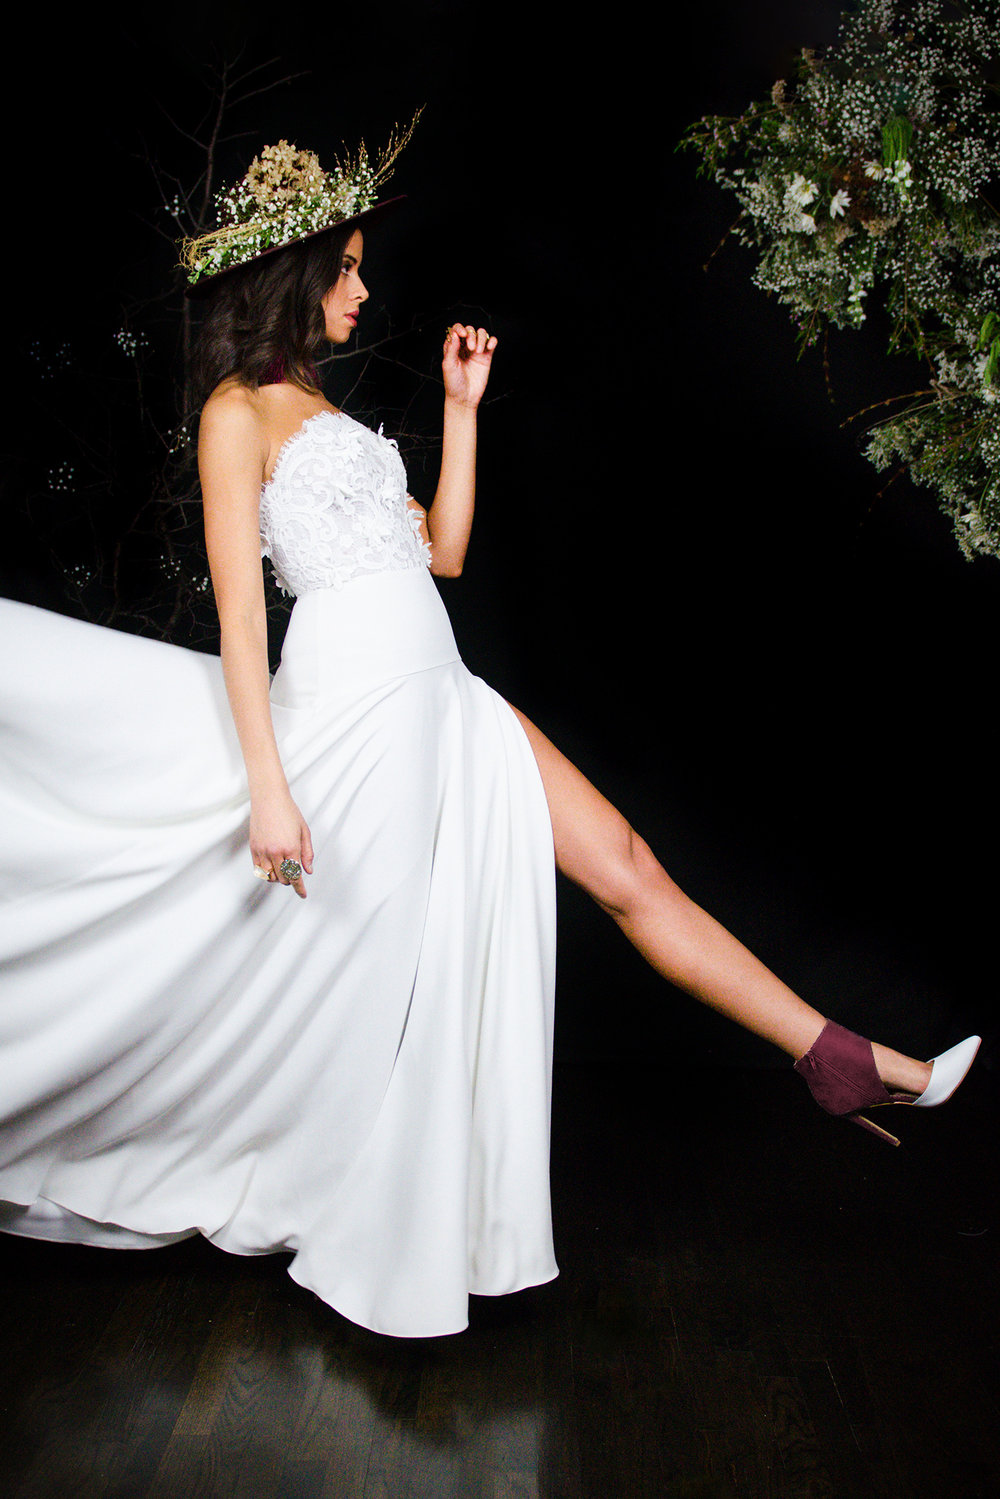 sv-bridal-whisky and diamonds-jackson-02.jpg